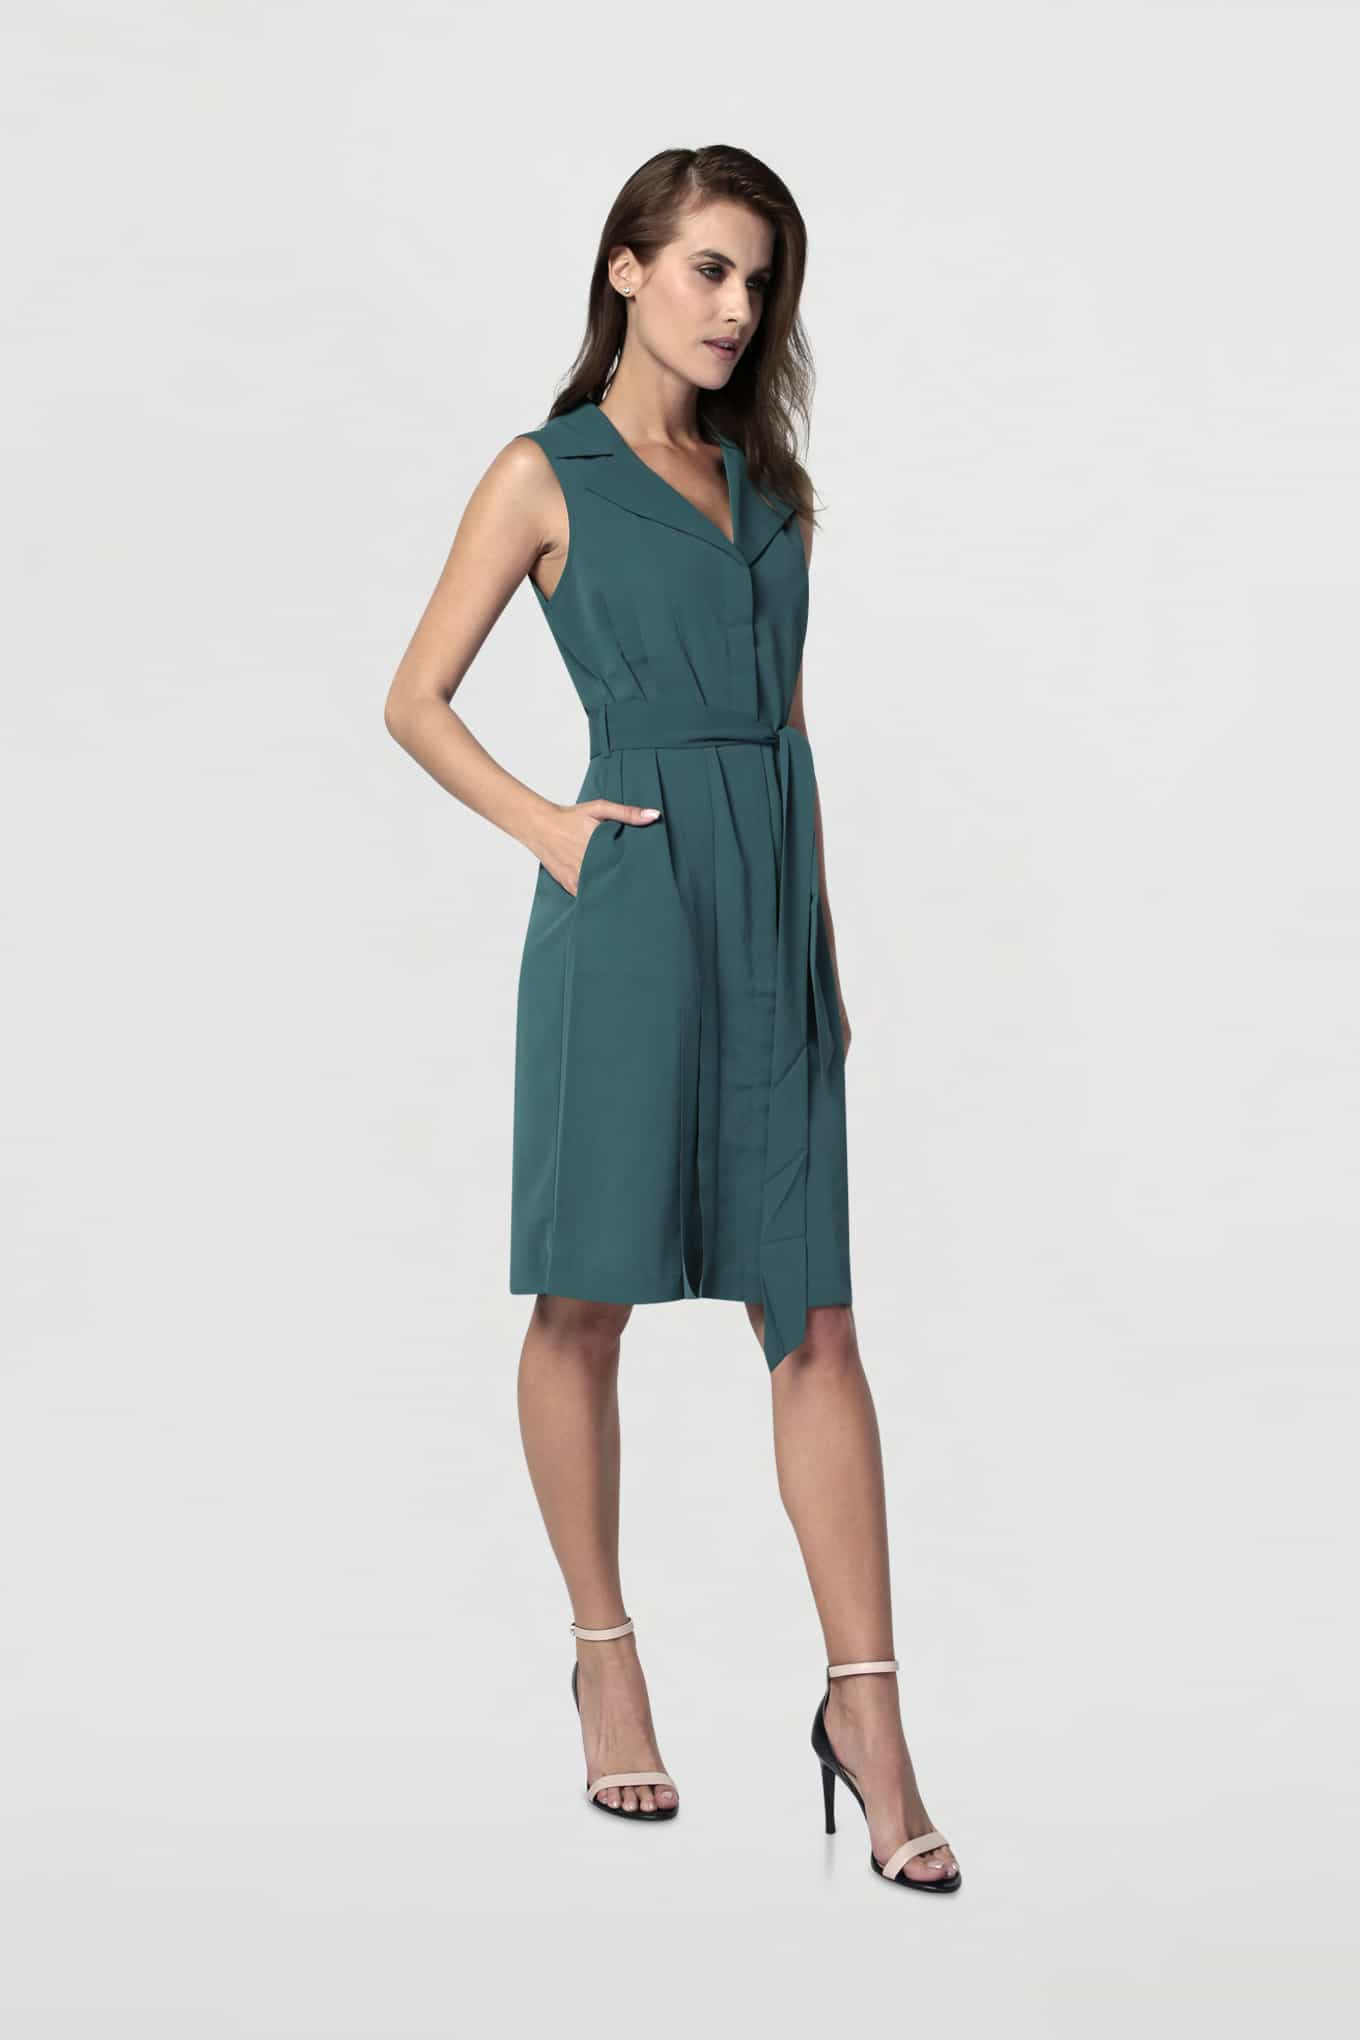 Dress Green Fantasy Woman